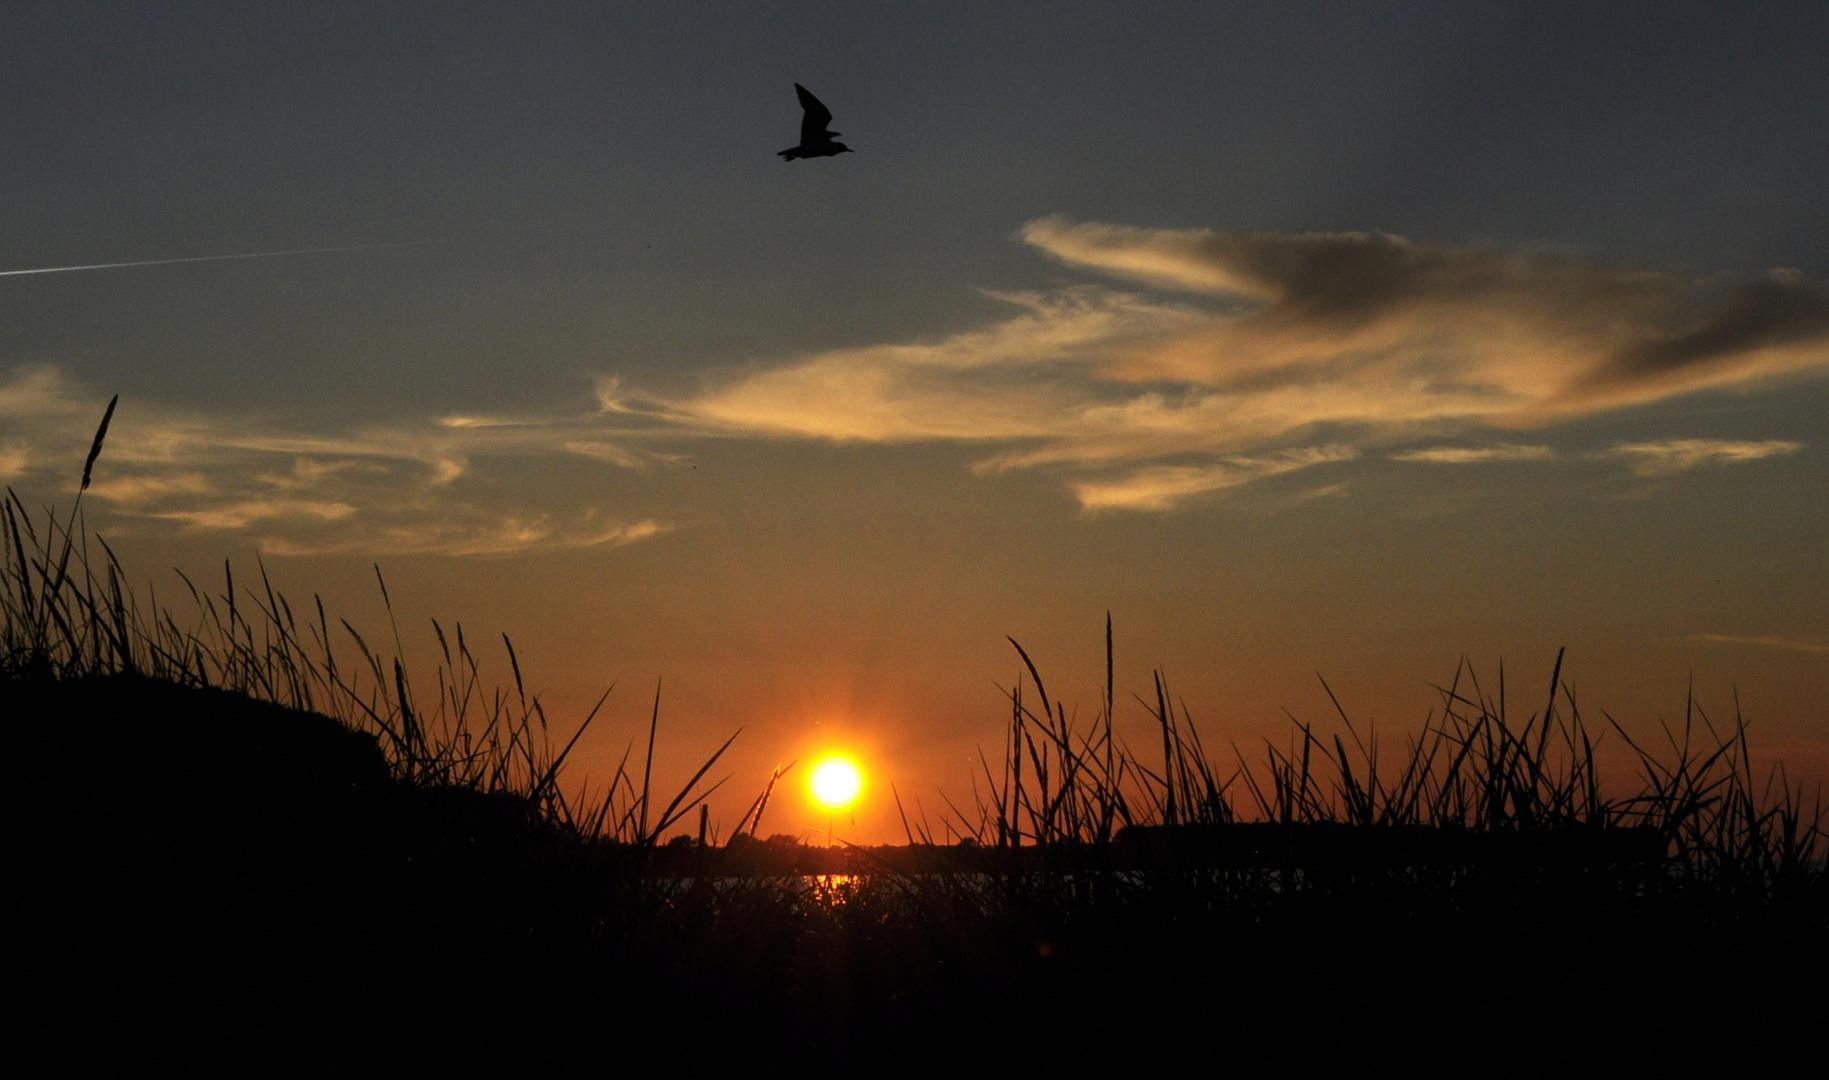 Sonnenuntergang am Ostseestrand bei Zierow